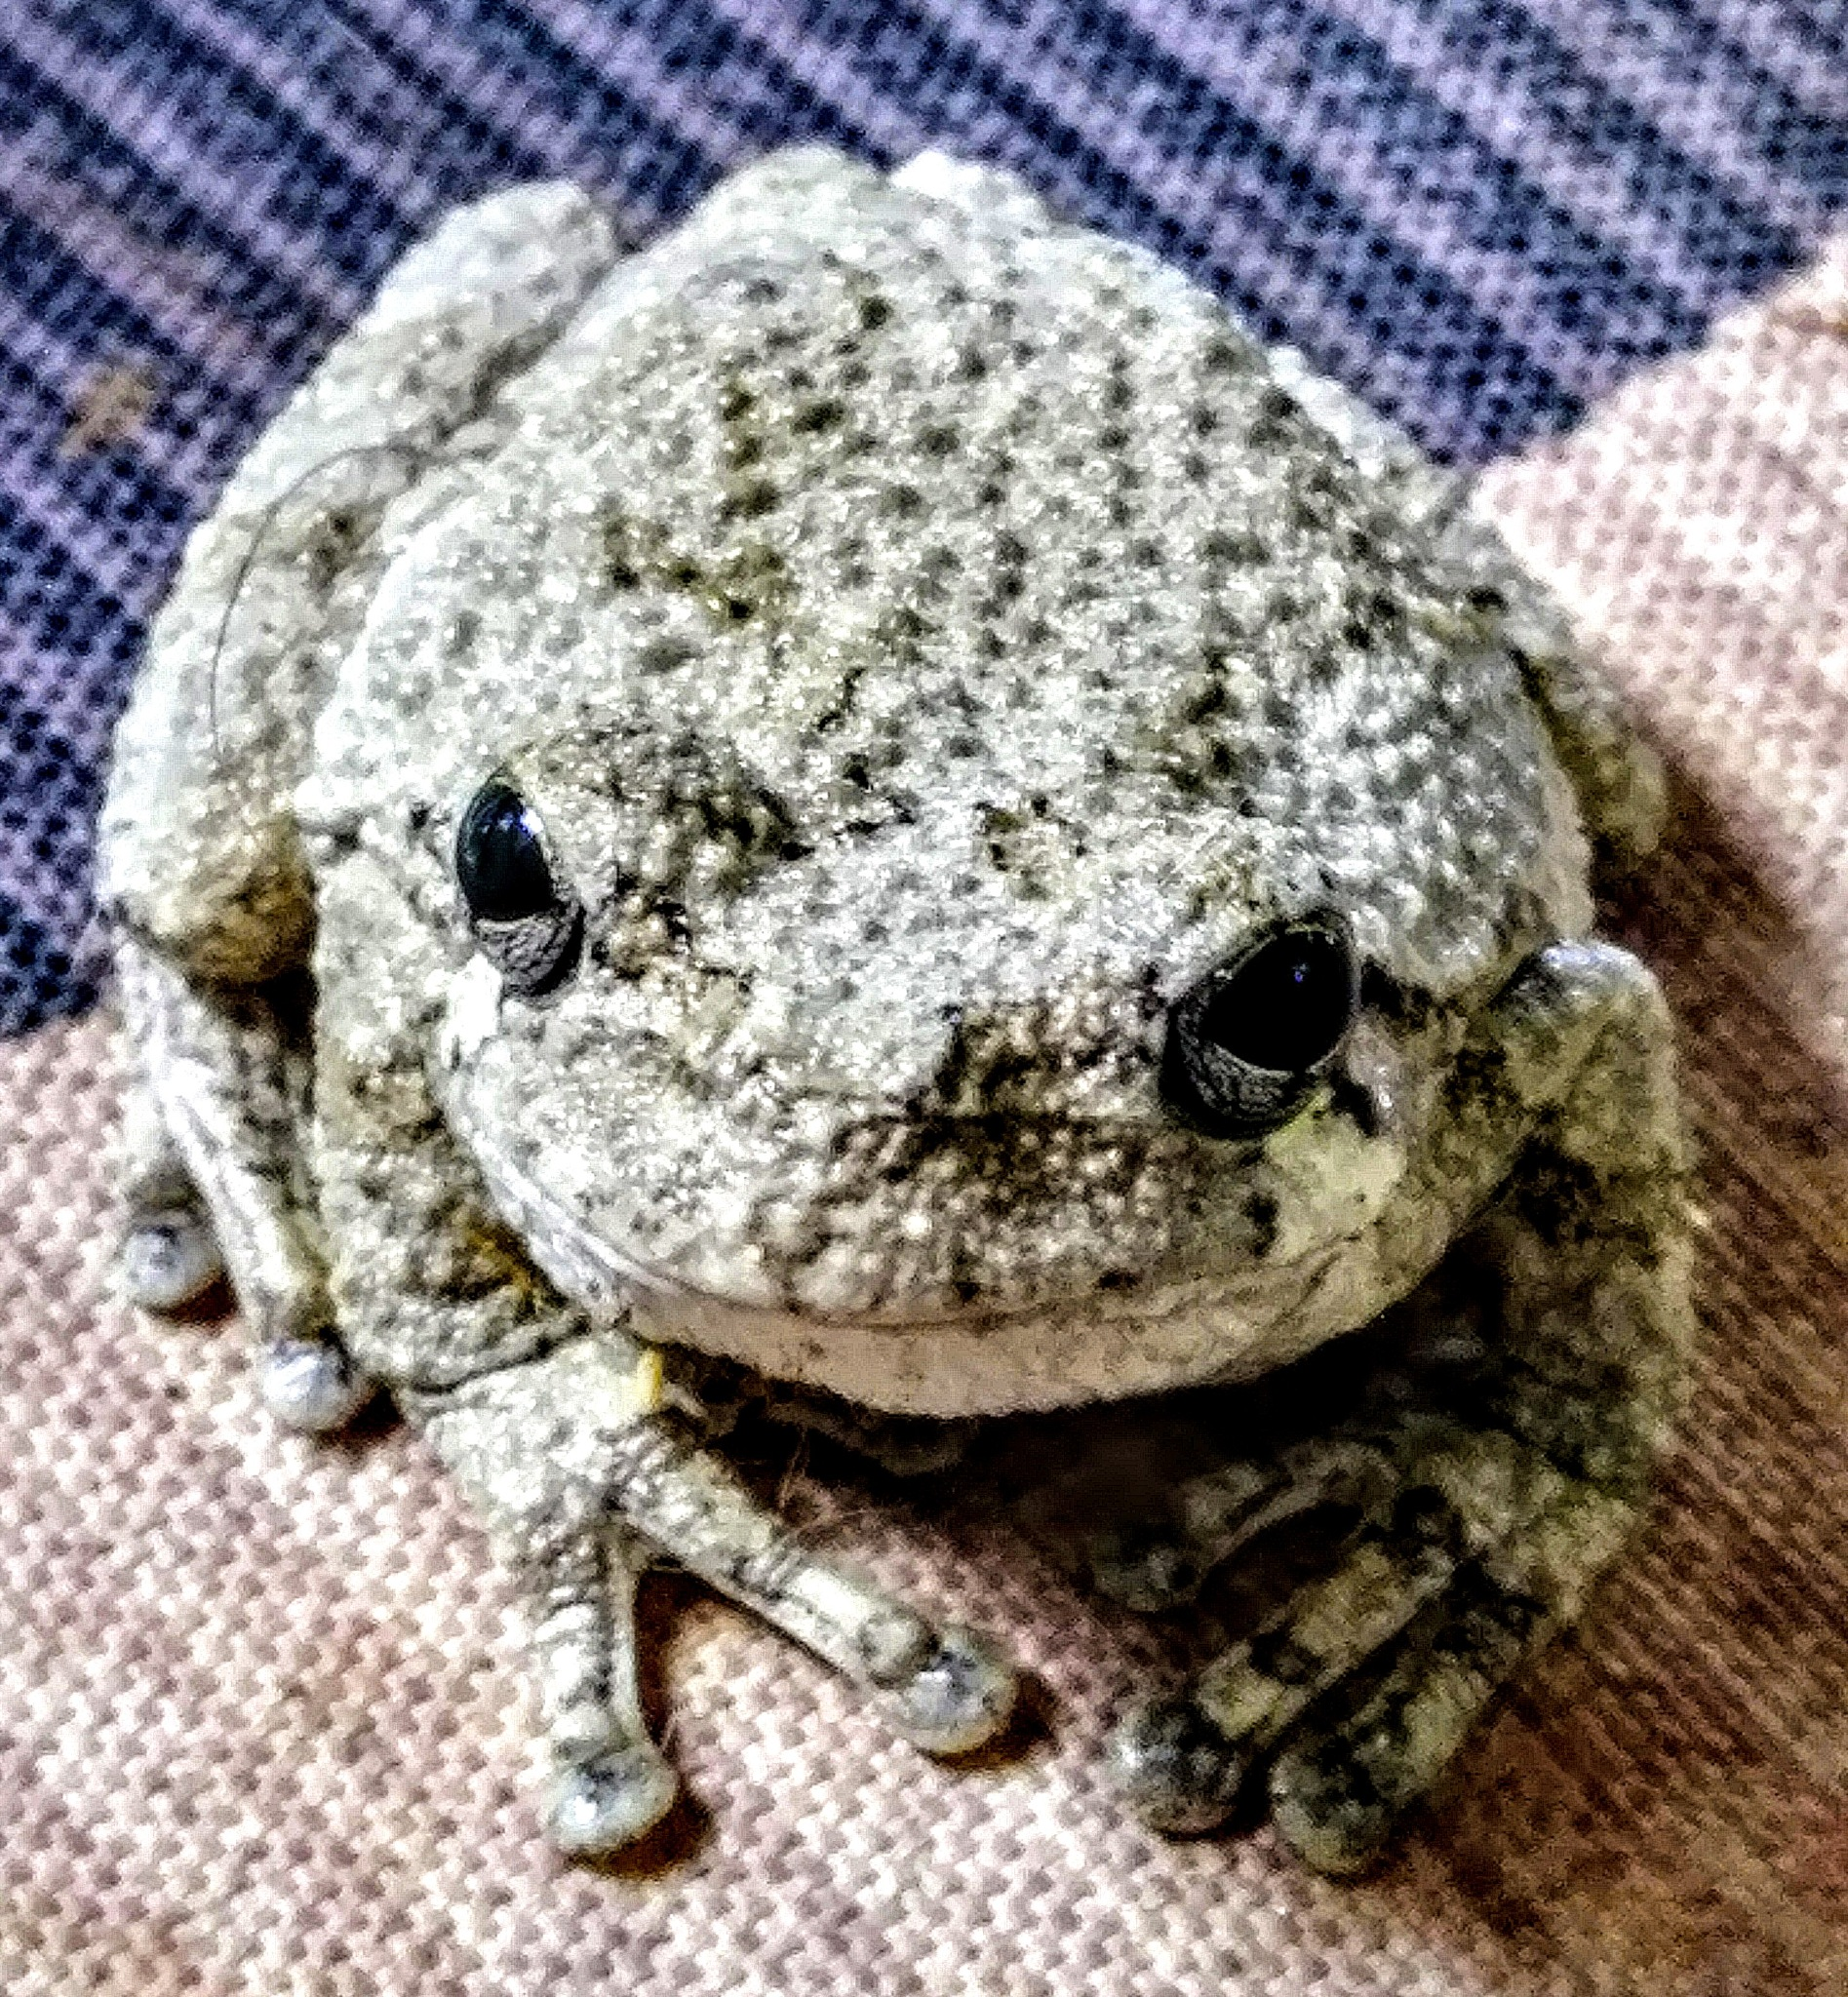 A Tree Frog by rodney.adams.313371